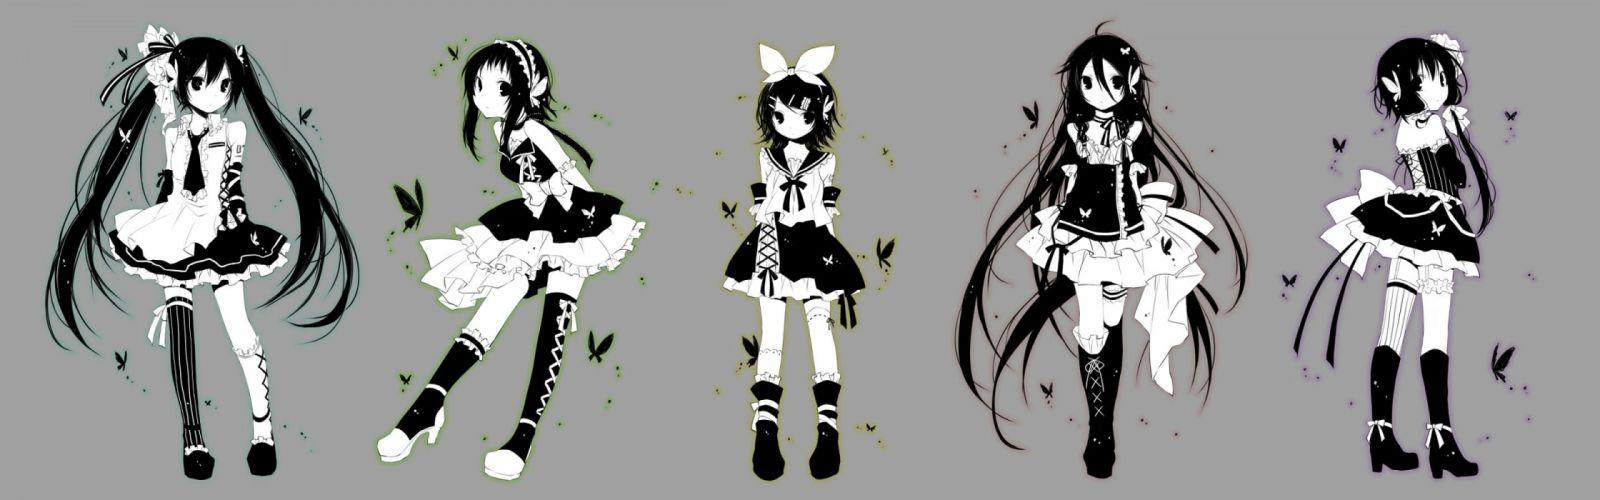 black hair dress gray gumi hatsune miku ia kagamine rin kuroi (liar-player) vocaloid yuzuki yukari wallpaper